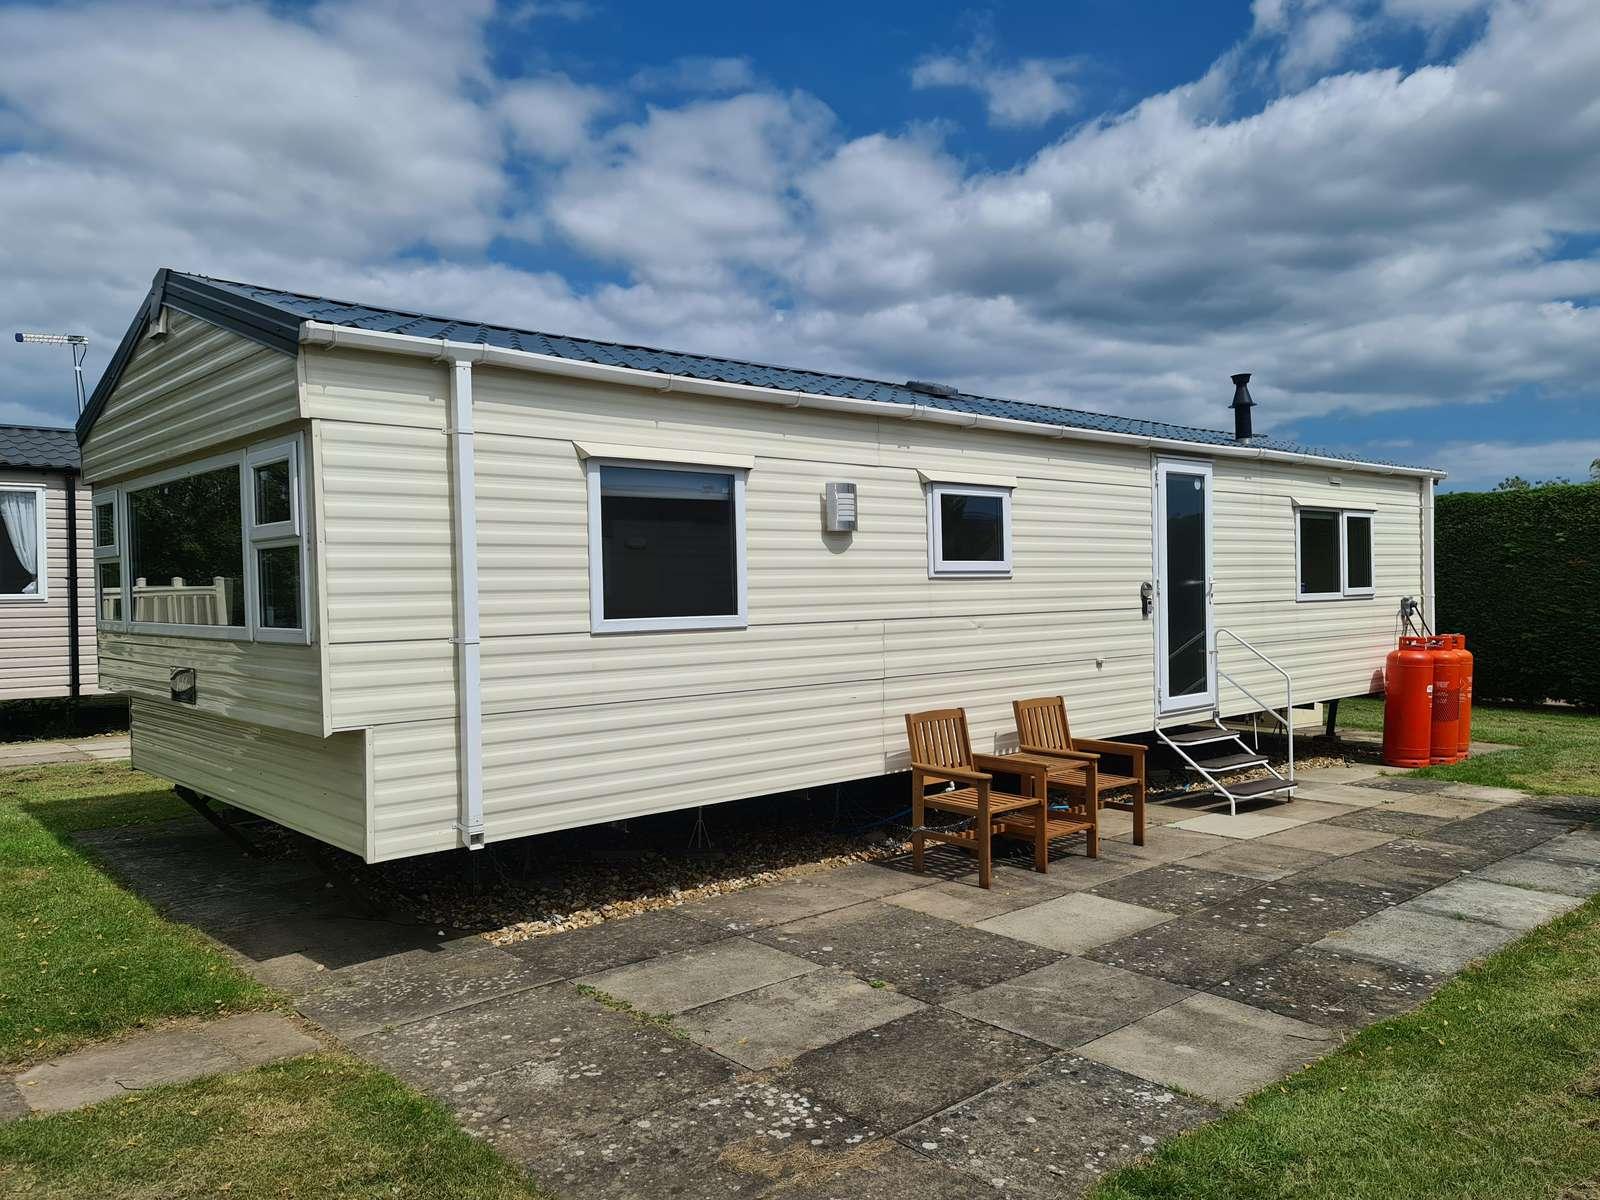 33010ML – Maple Lake area, 2 bed, 6 berth caravan near amenities. Diamond rated. - property